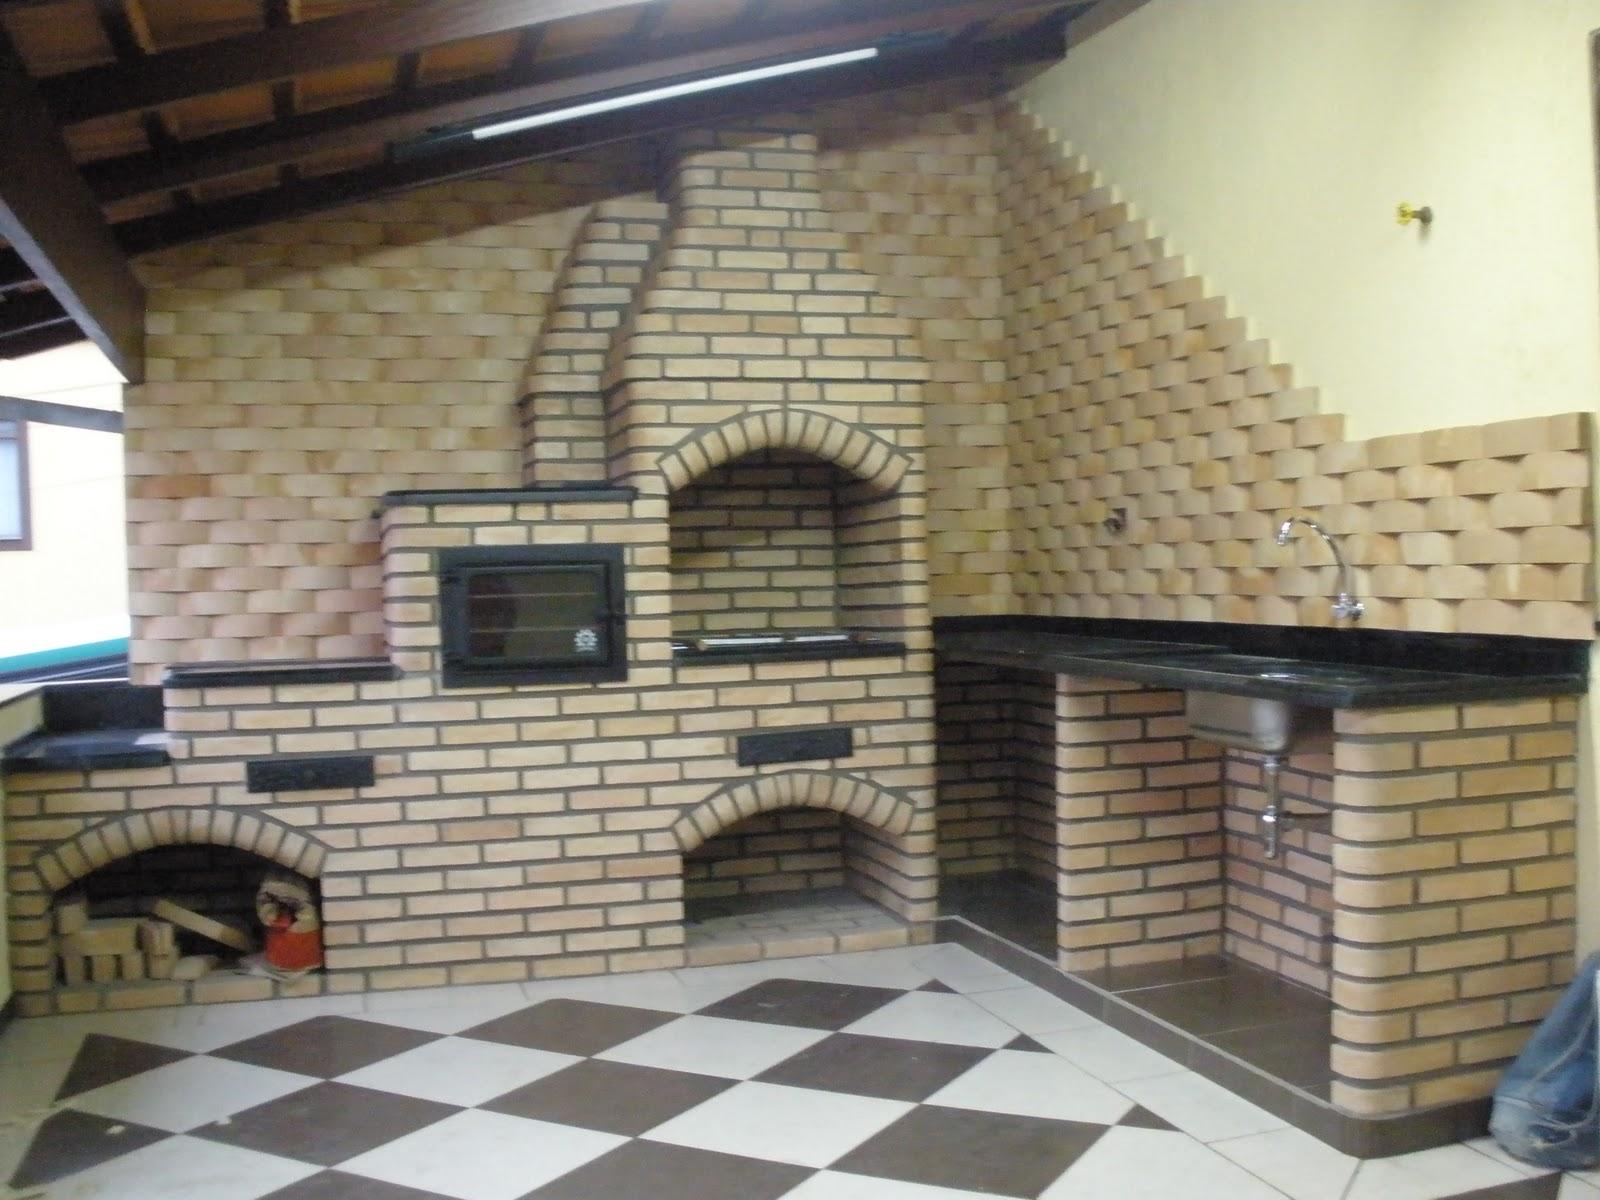 Revestimento para churrasqueira de tijolos Decorando Casas #7D734E 1600 1200